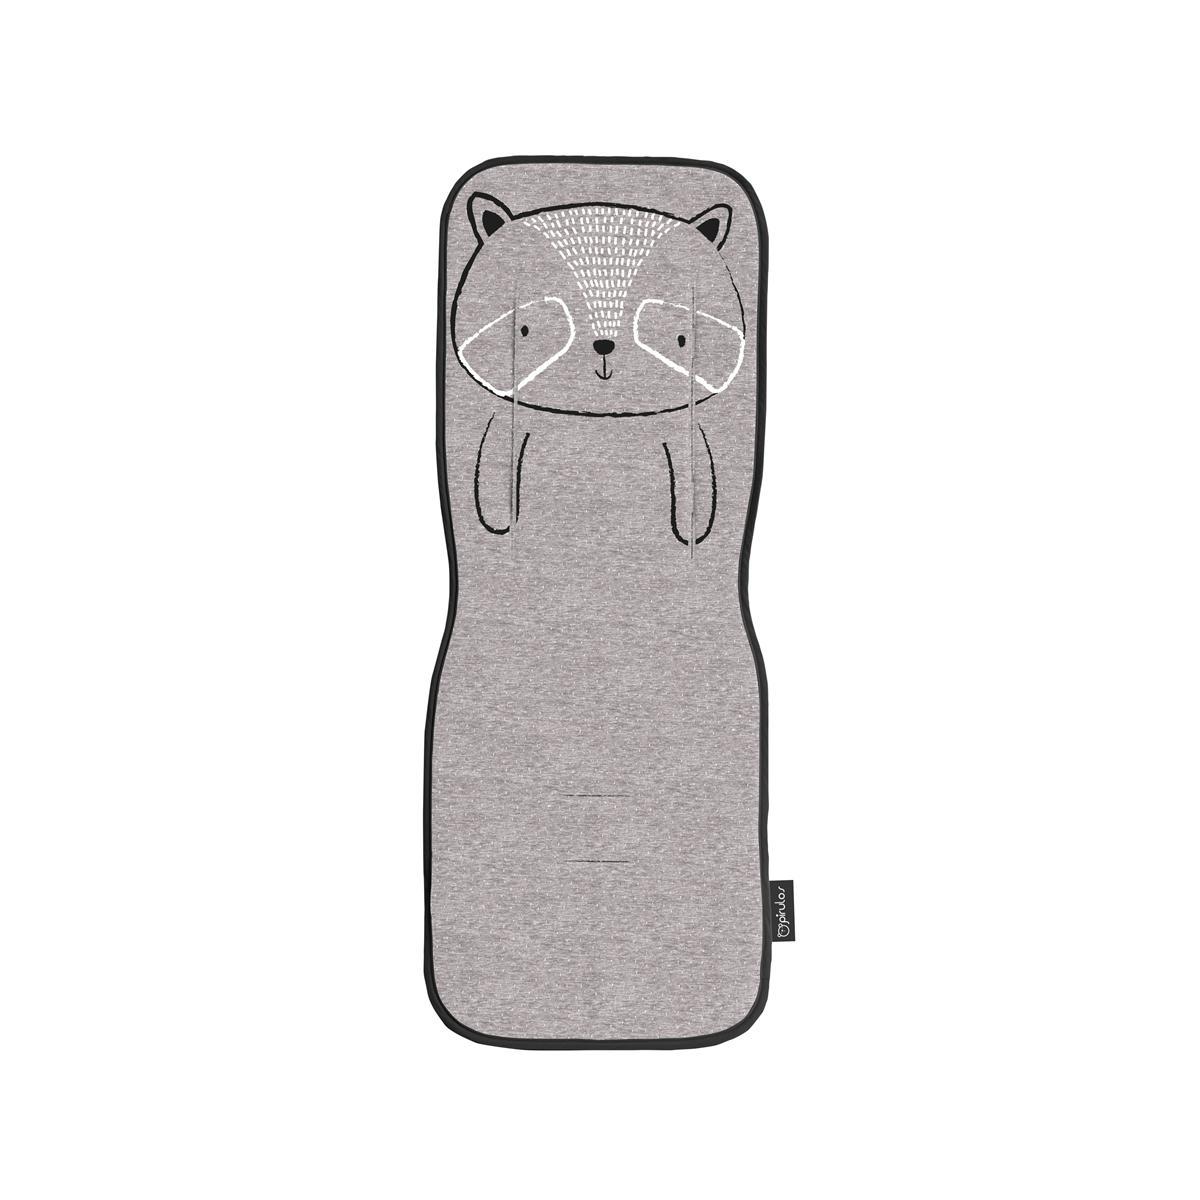 Colchoneta silla de paseo universal Pirulos mod. Zoológico color gris.